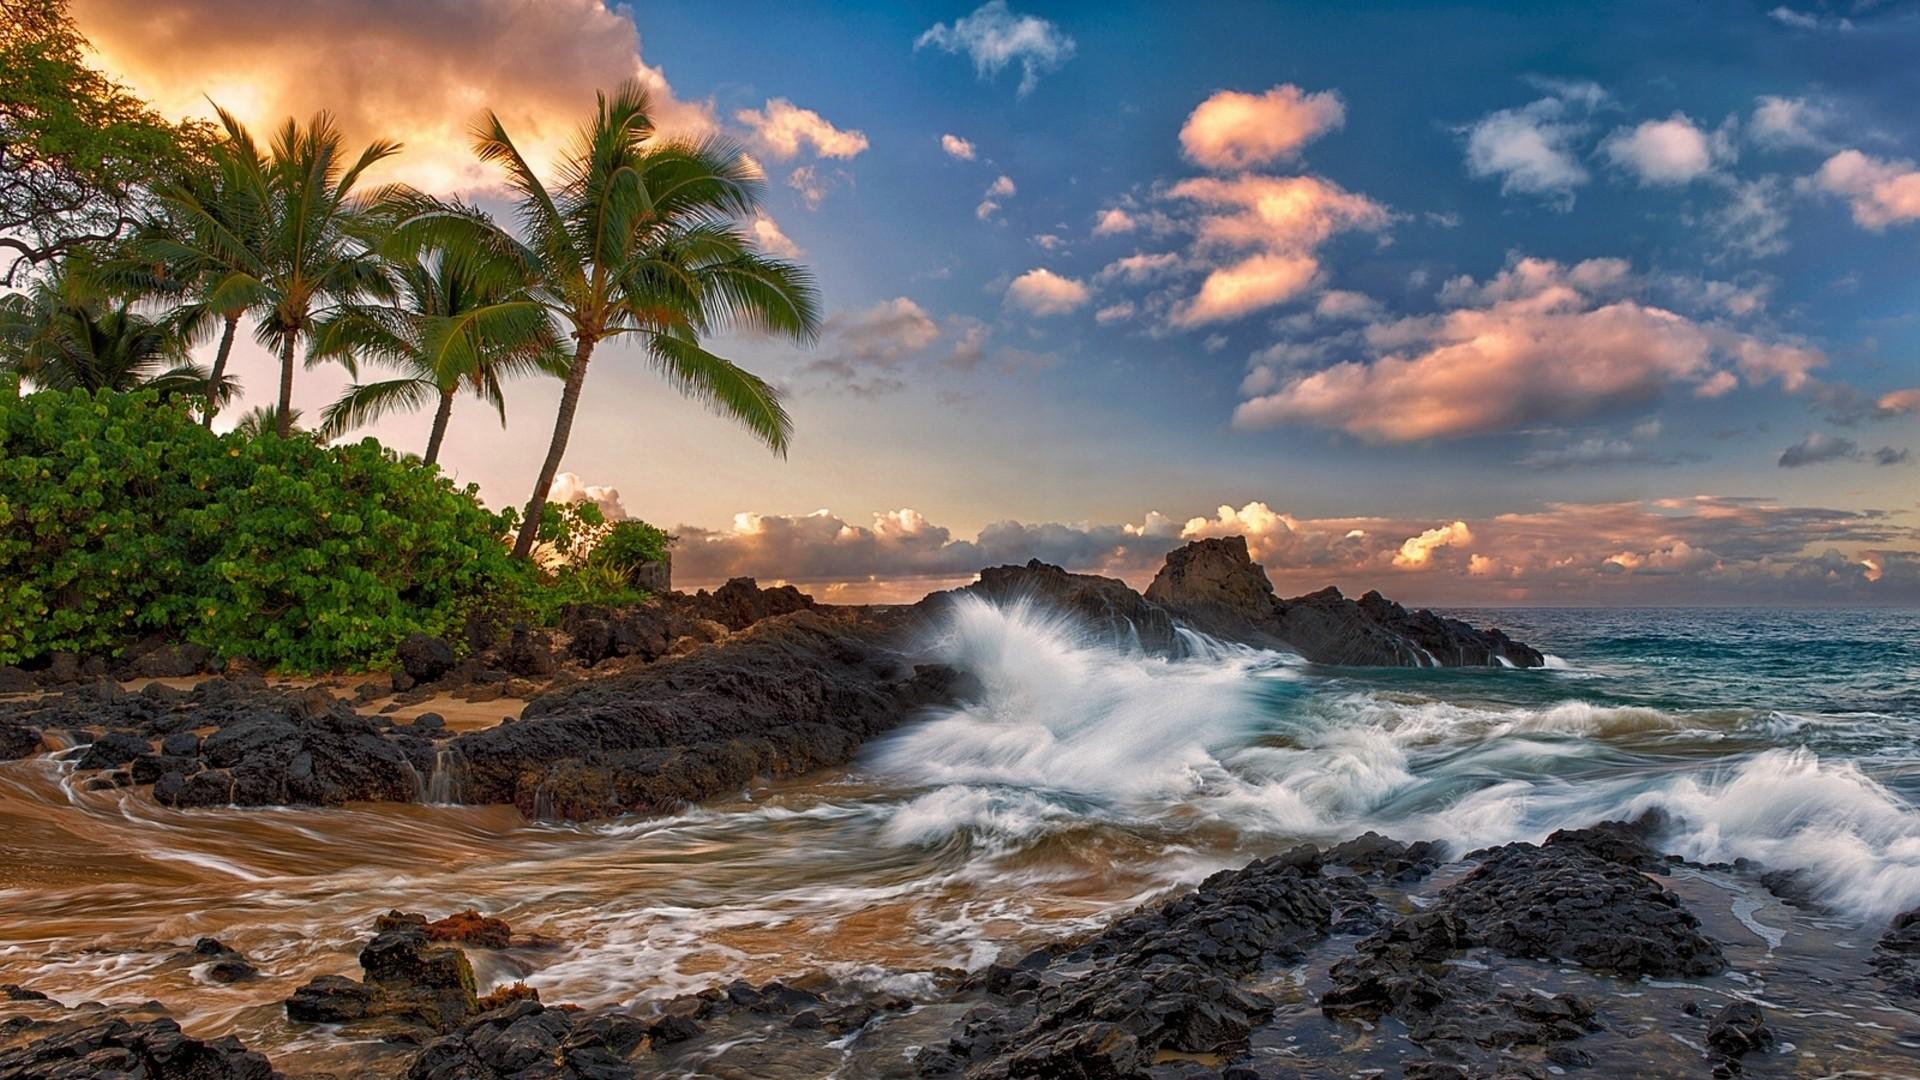 Preview wallpaper maui, hawaii, pacific ocean, rock, surf, rocks, palm